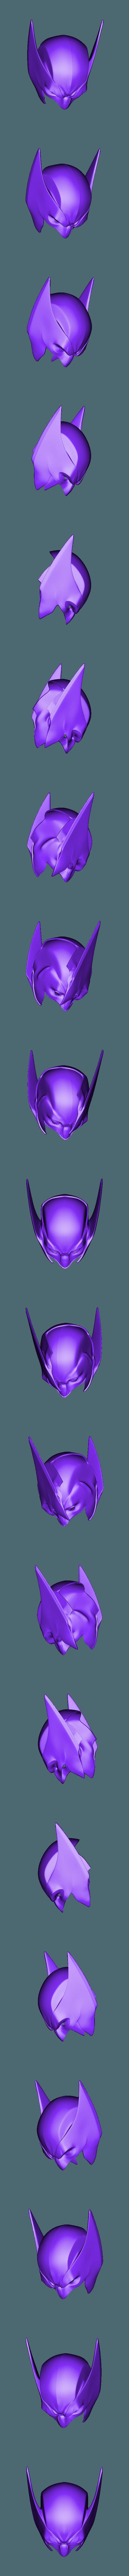 LongEarBackCut.stl Download STL file Wolverine Mask • 3D printable model, VillainousPropShop